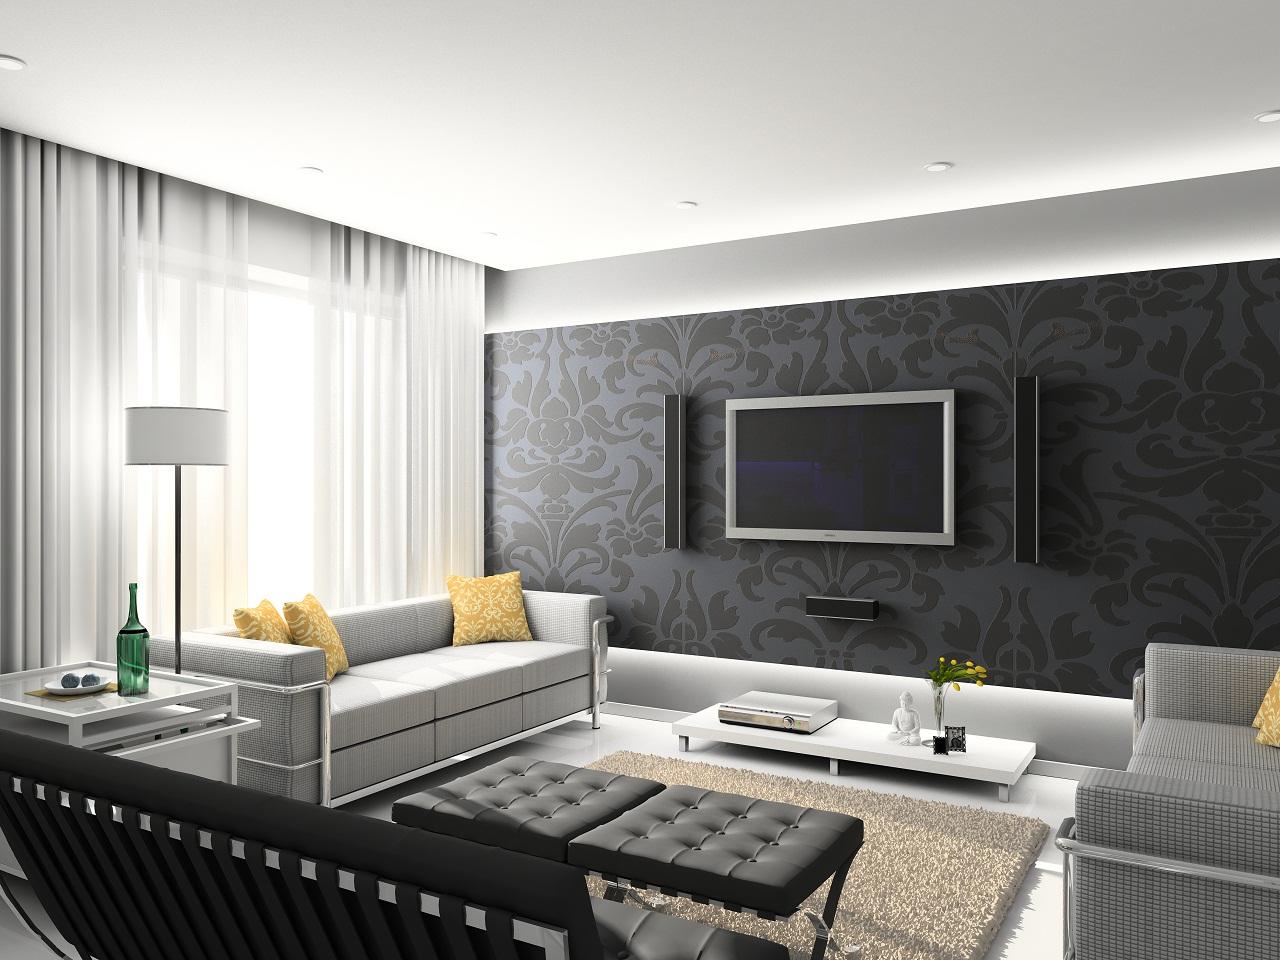 Interior Decorating Terms